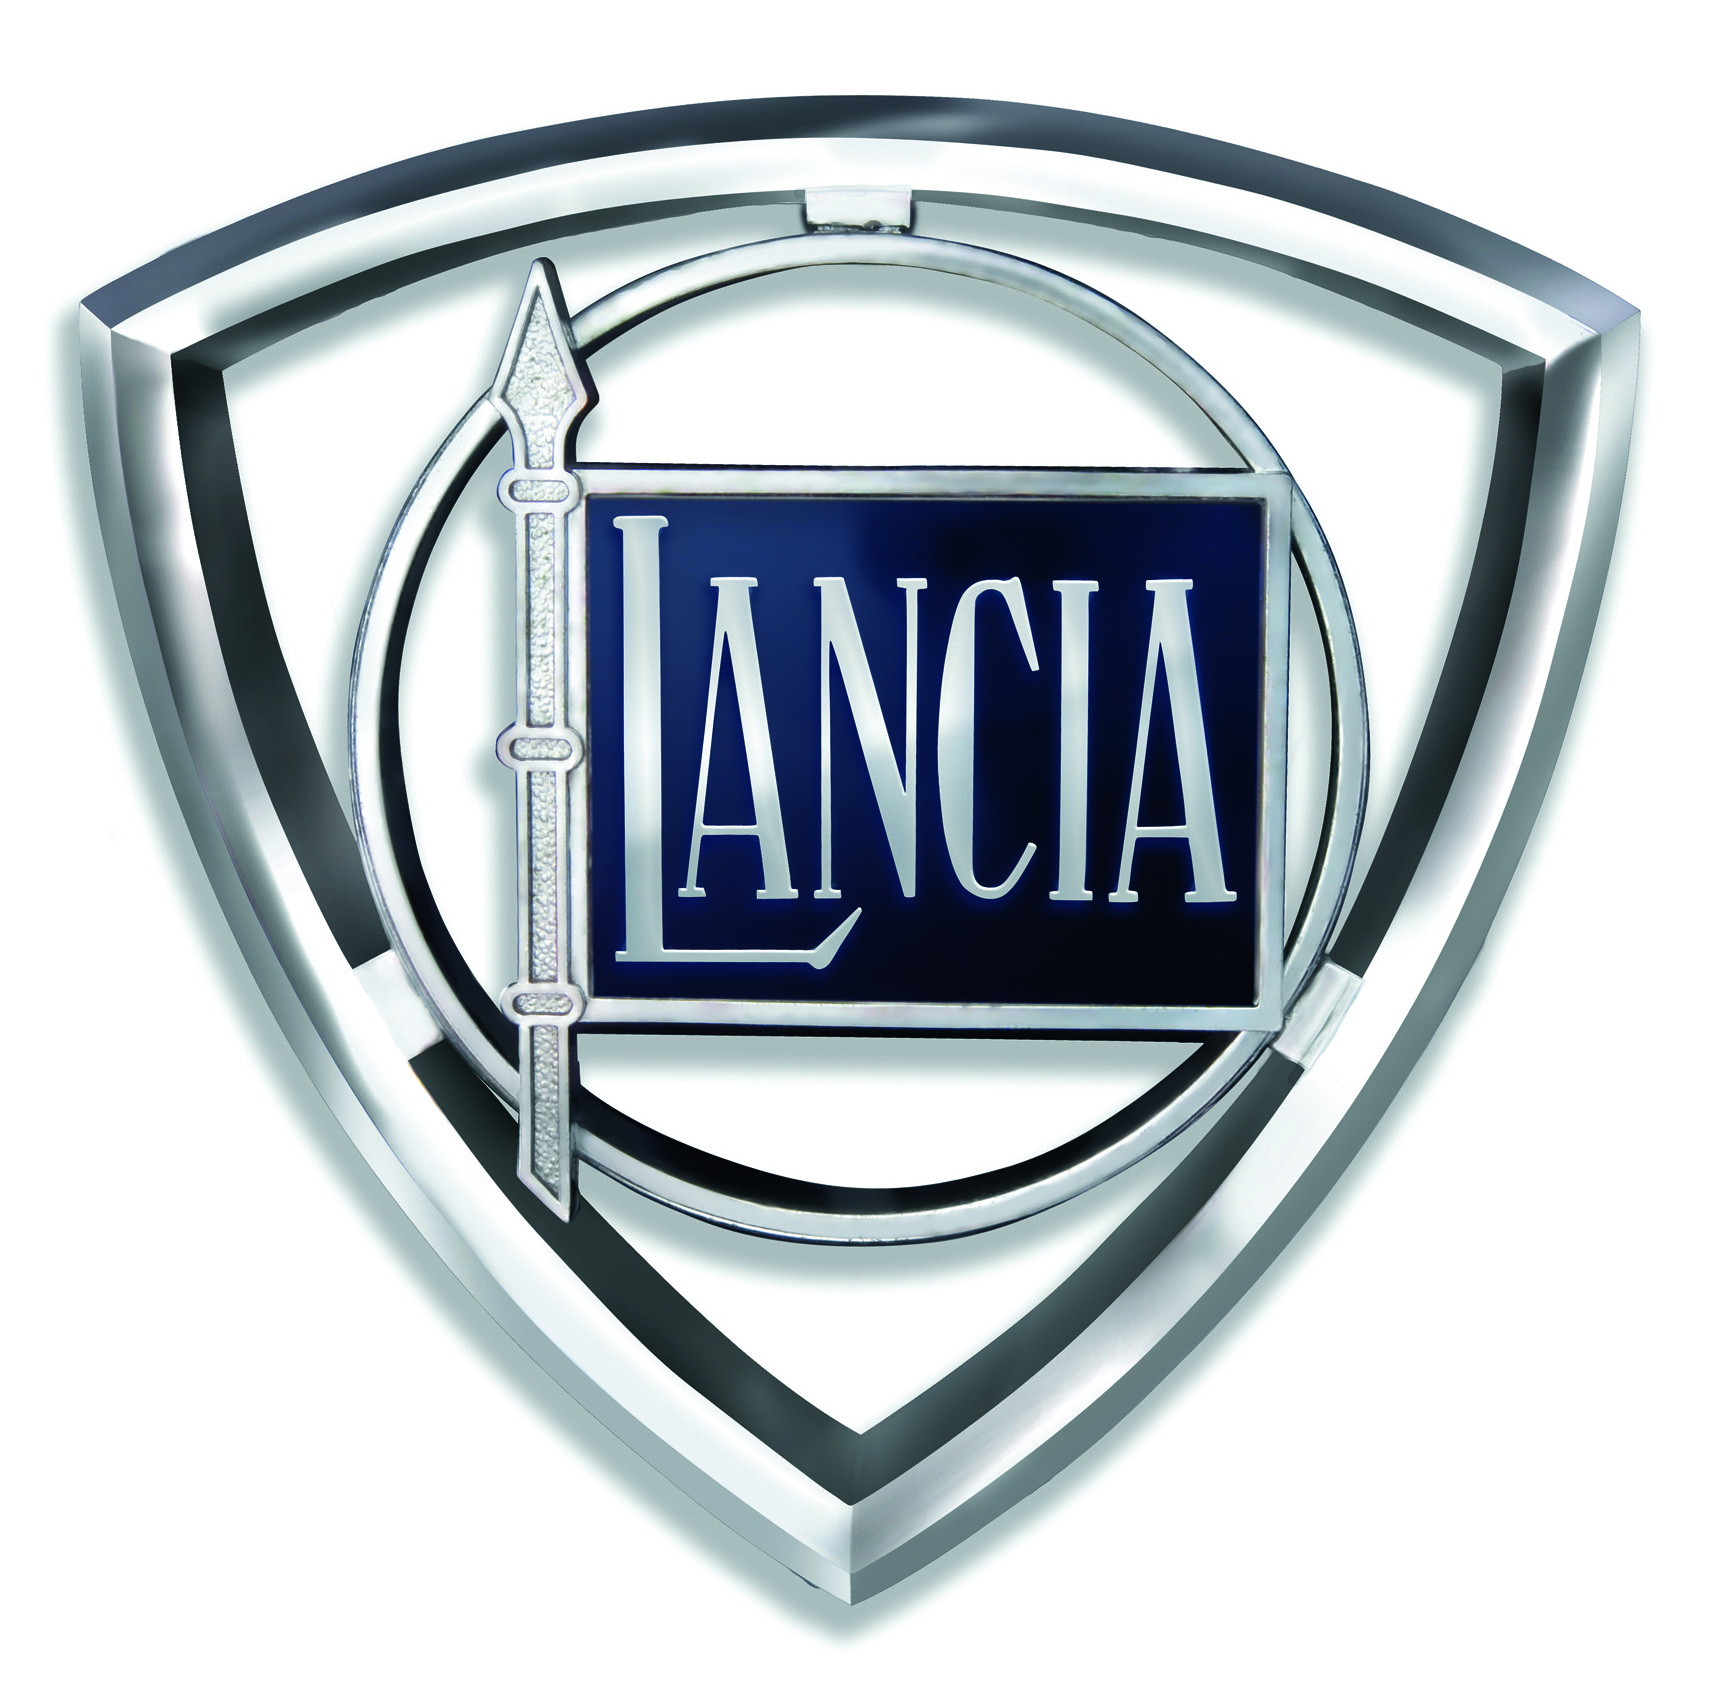 Lancia Logo, Lancia Car Symbol Meaning and History.